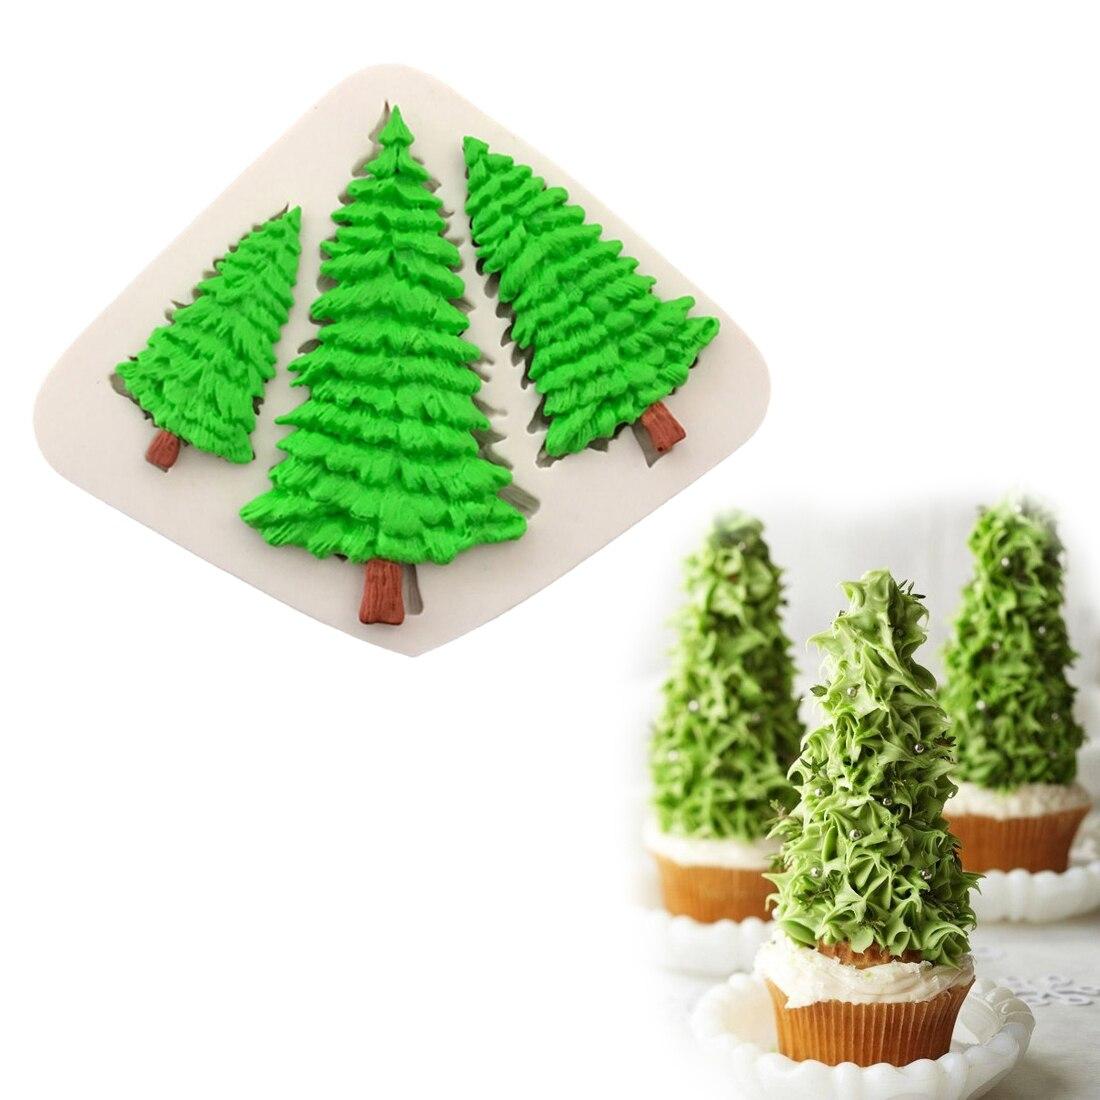 Attractive Pine Garden Design Cake Composition - Beautiful Garden ...